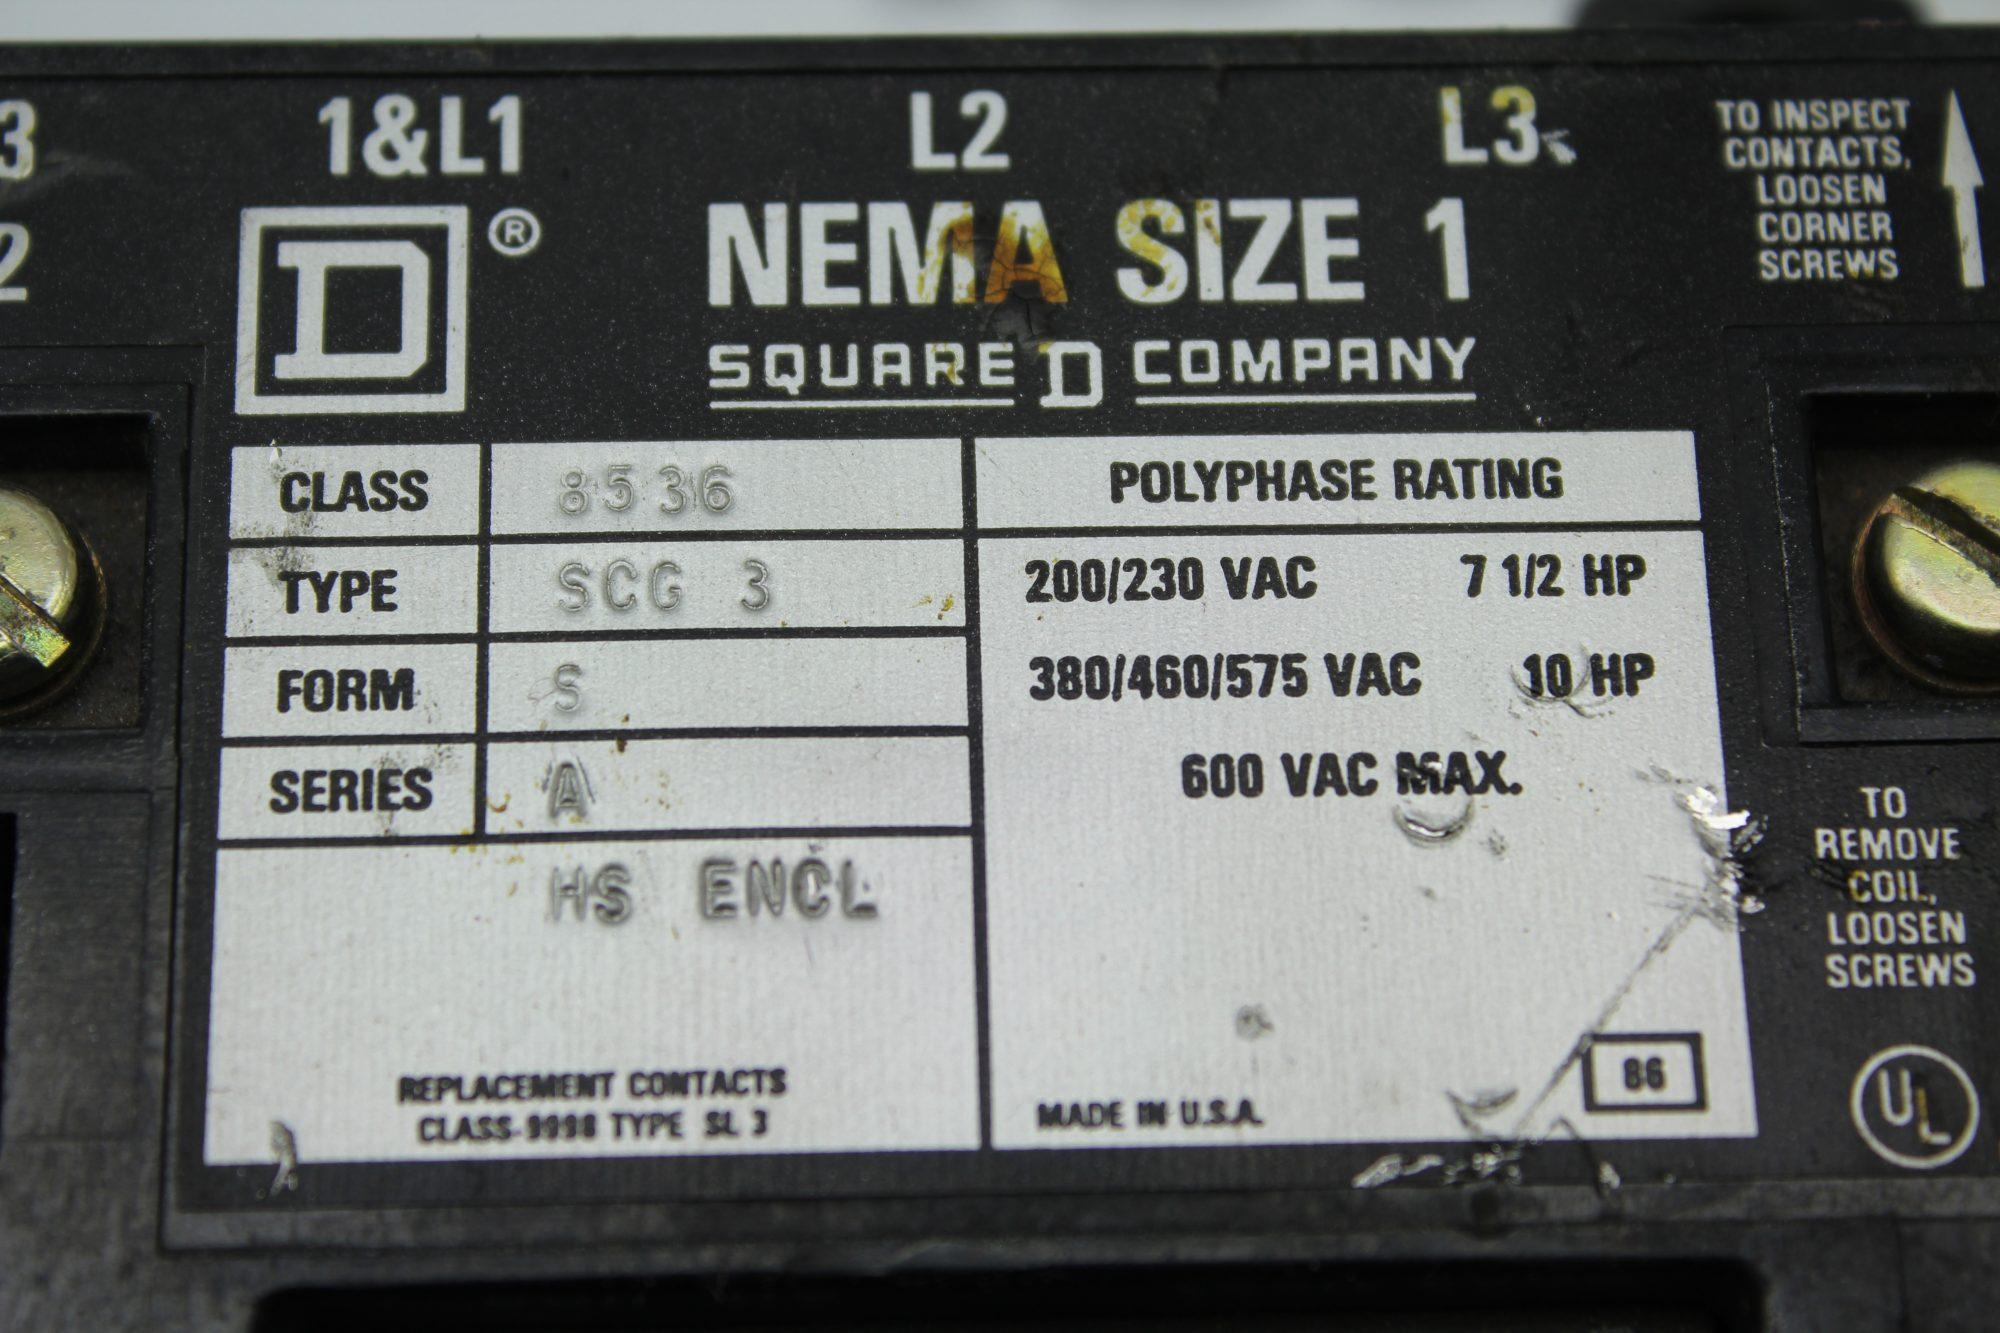 Square D Nema Size 1 8536 SCG 3 Contactor Coil Starter